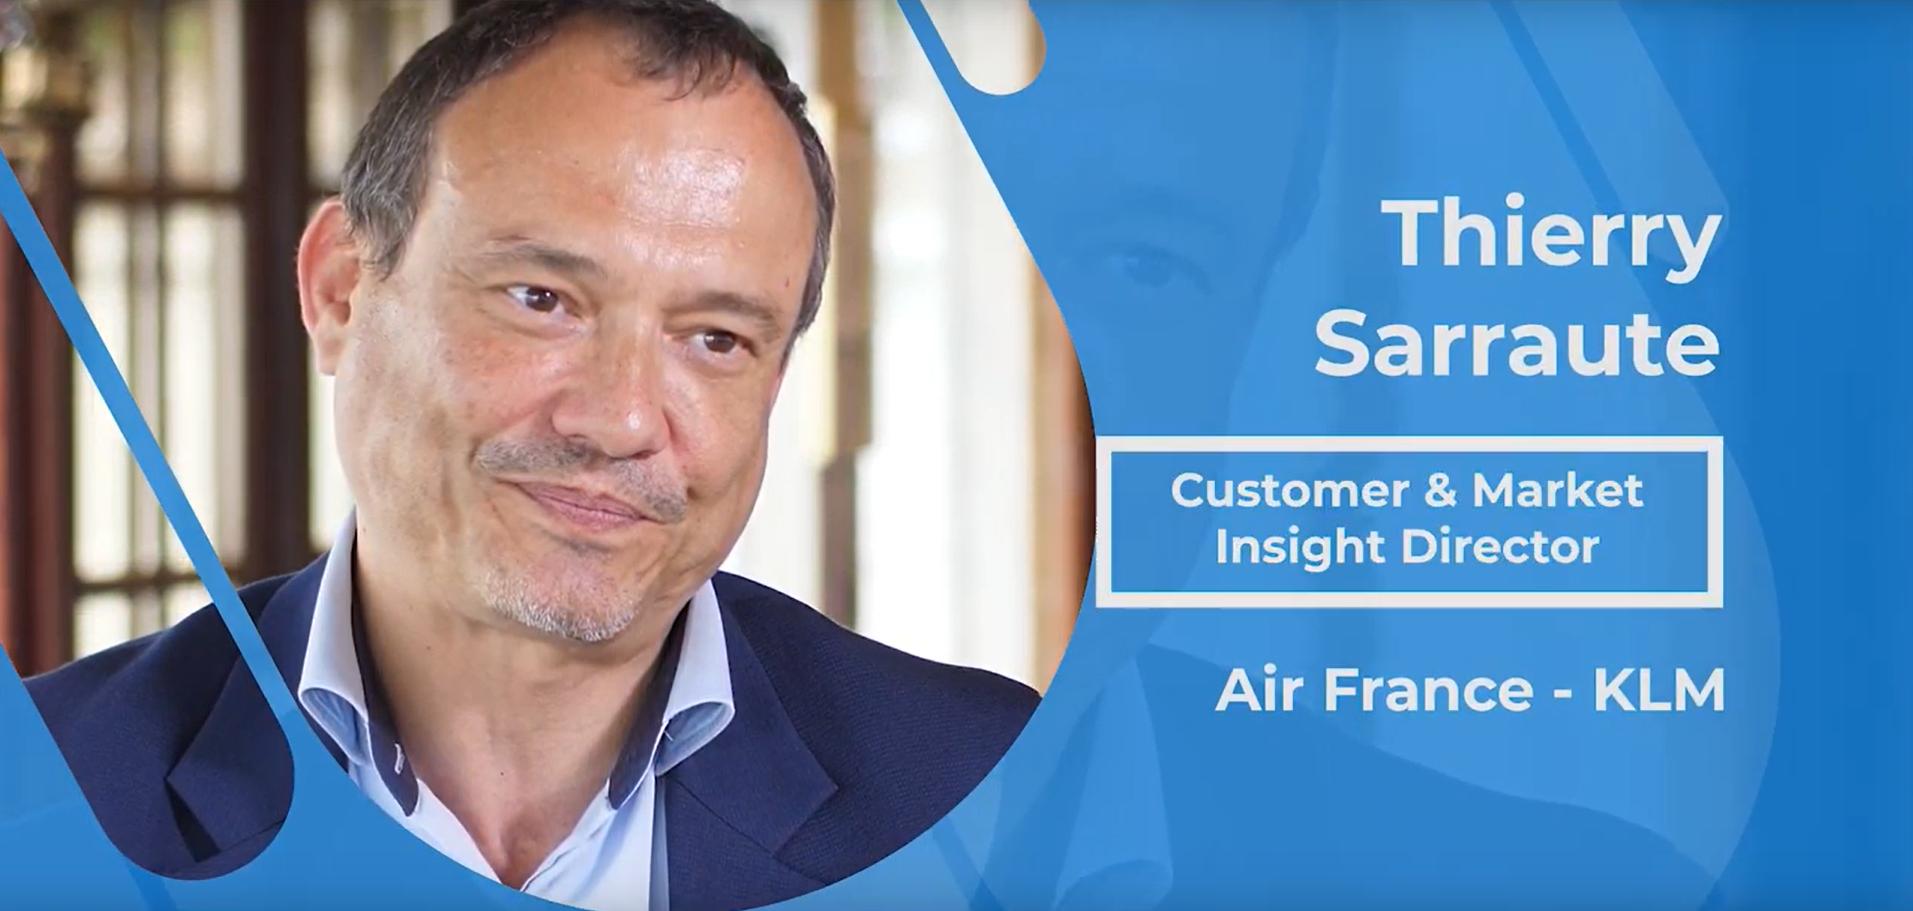 Actualités : Interview Thierry Sarraute - Customer & market insight director chez Air France KLM